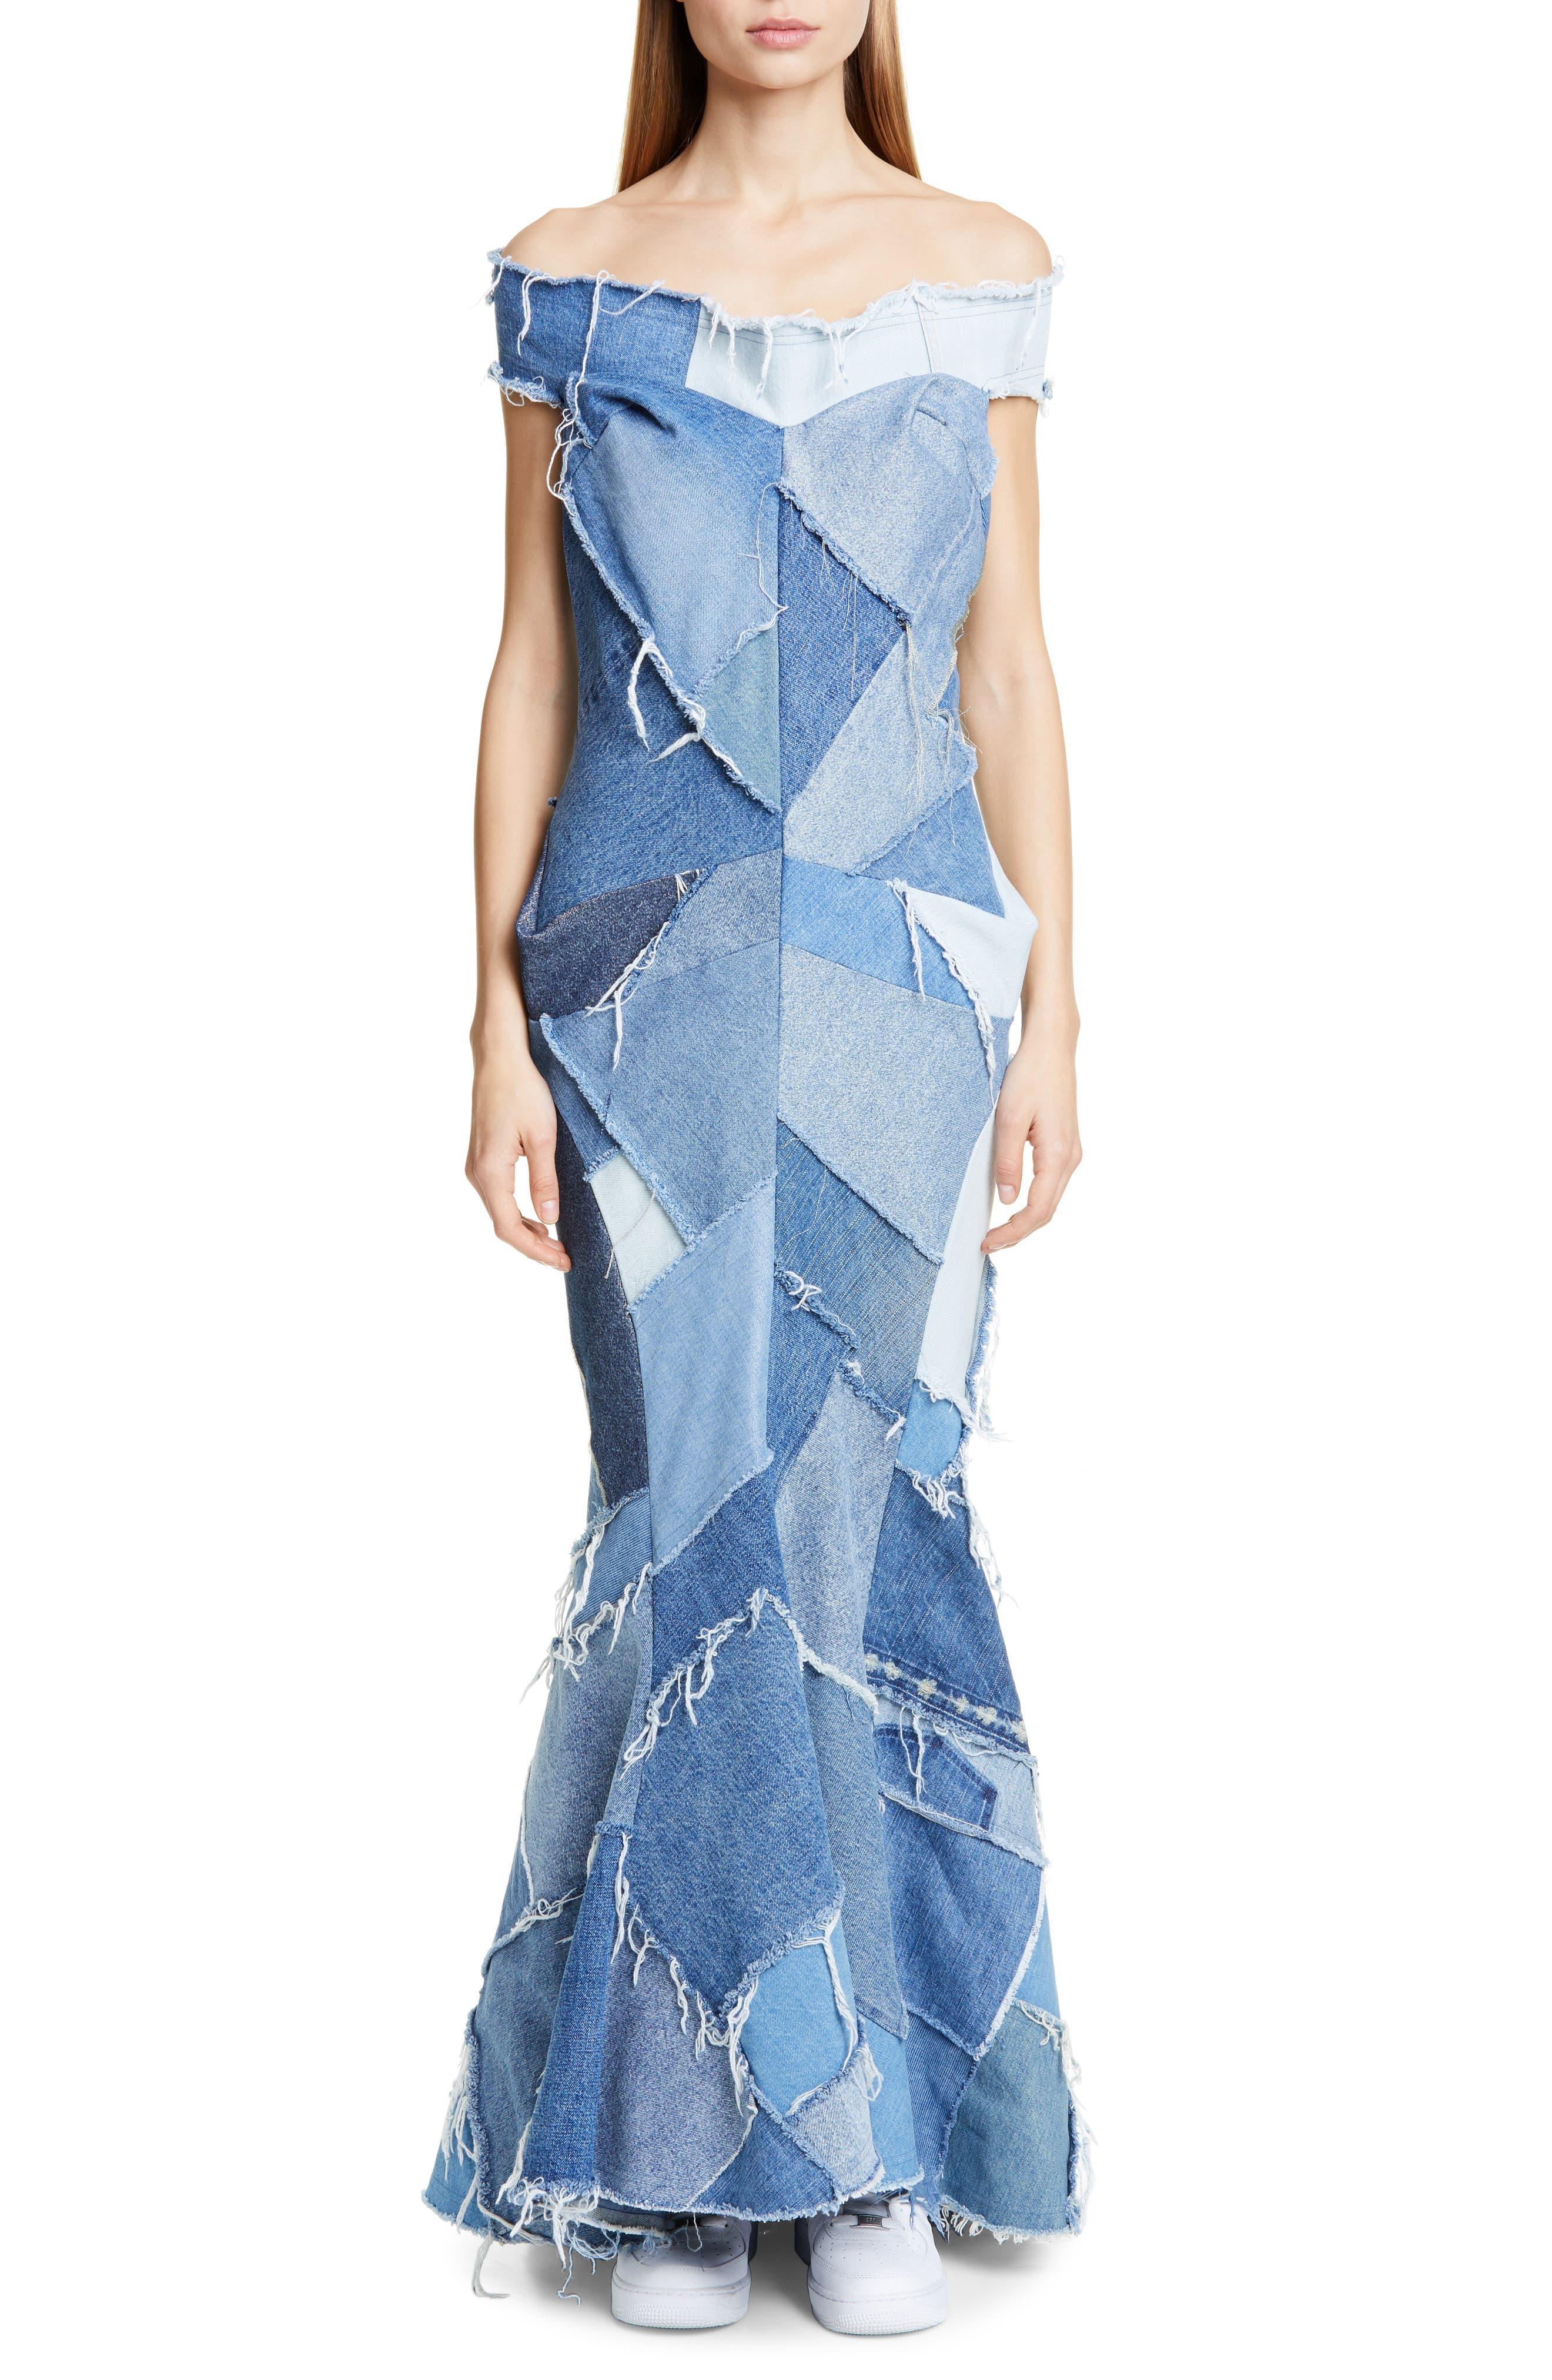 Junya Watanabe Denim Patchwork Off The Shoulder Mermaid Dress, Blue